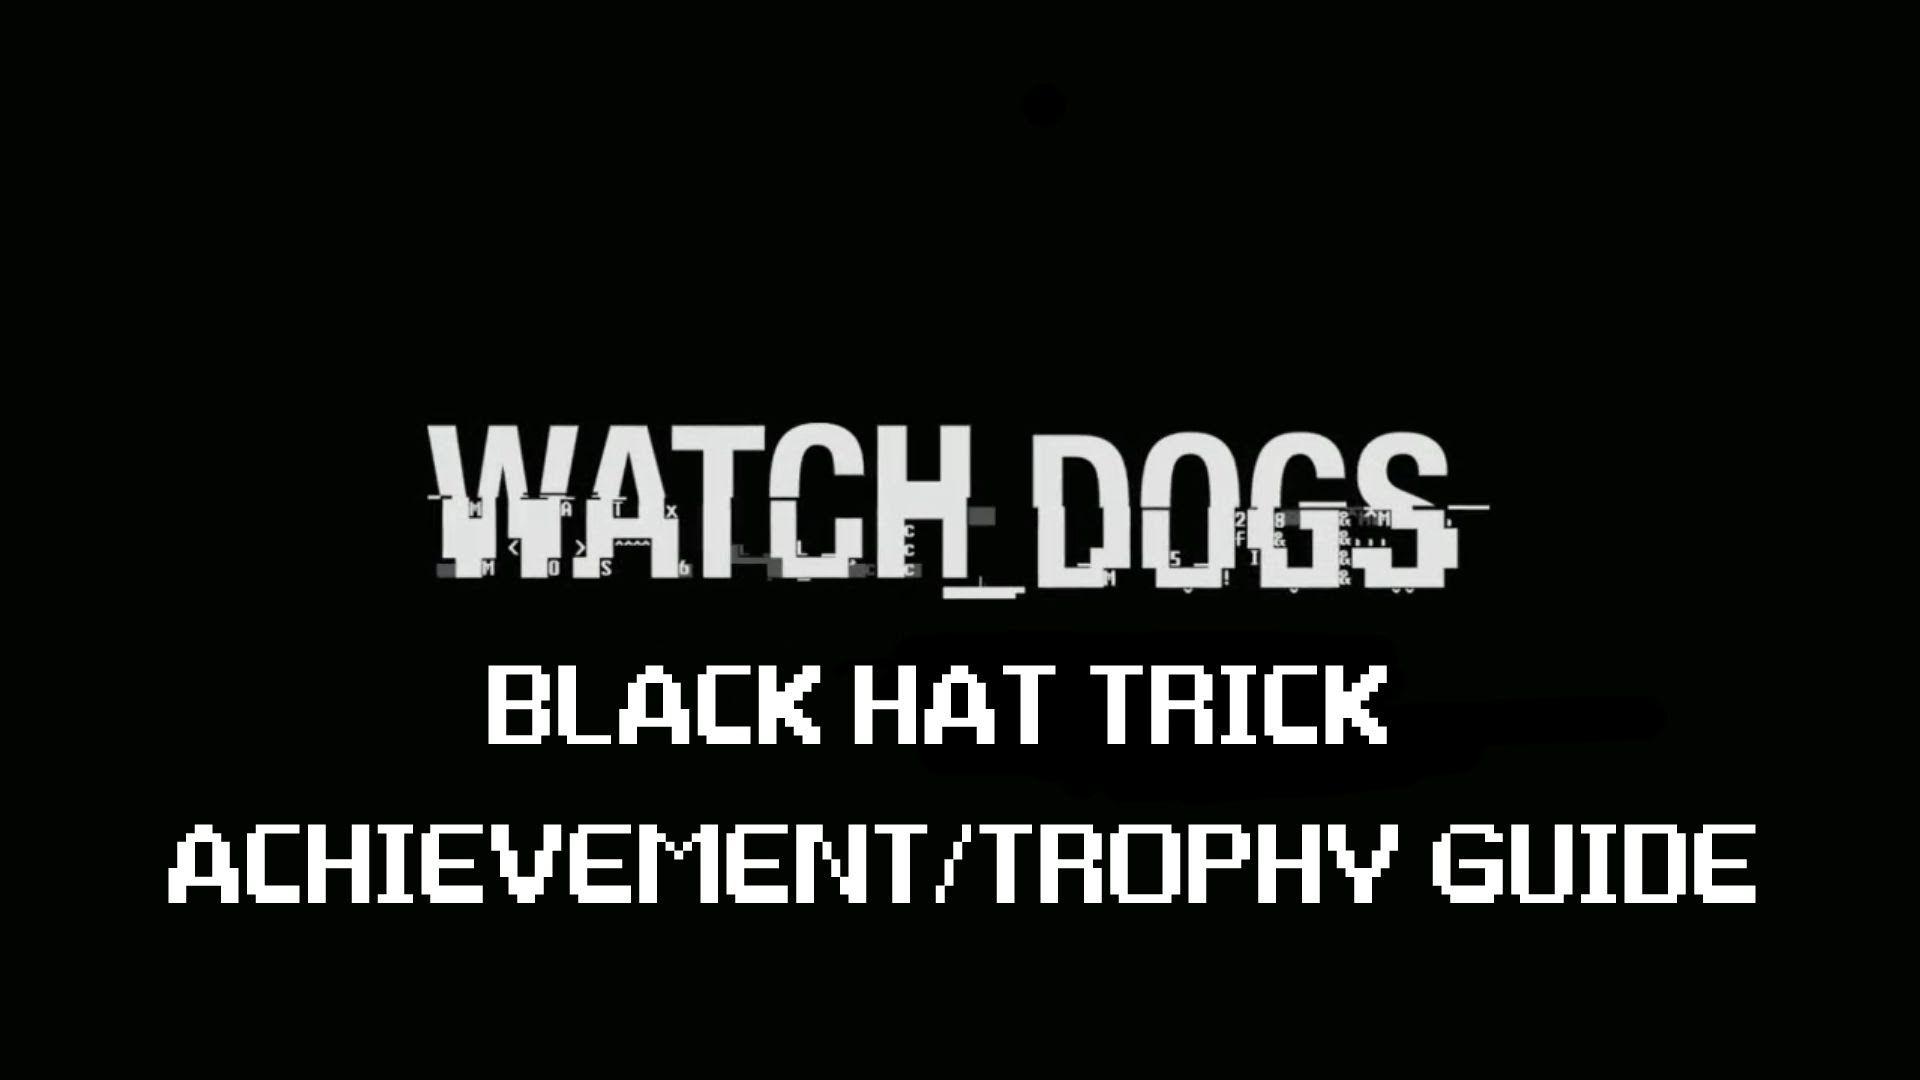 Watch Dogs Guide Black Hat Trick Achievement Trophy Watch Dogs Trophy Black Hat